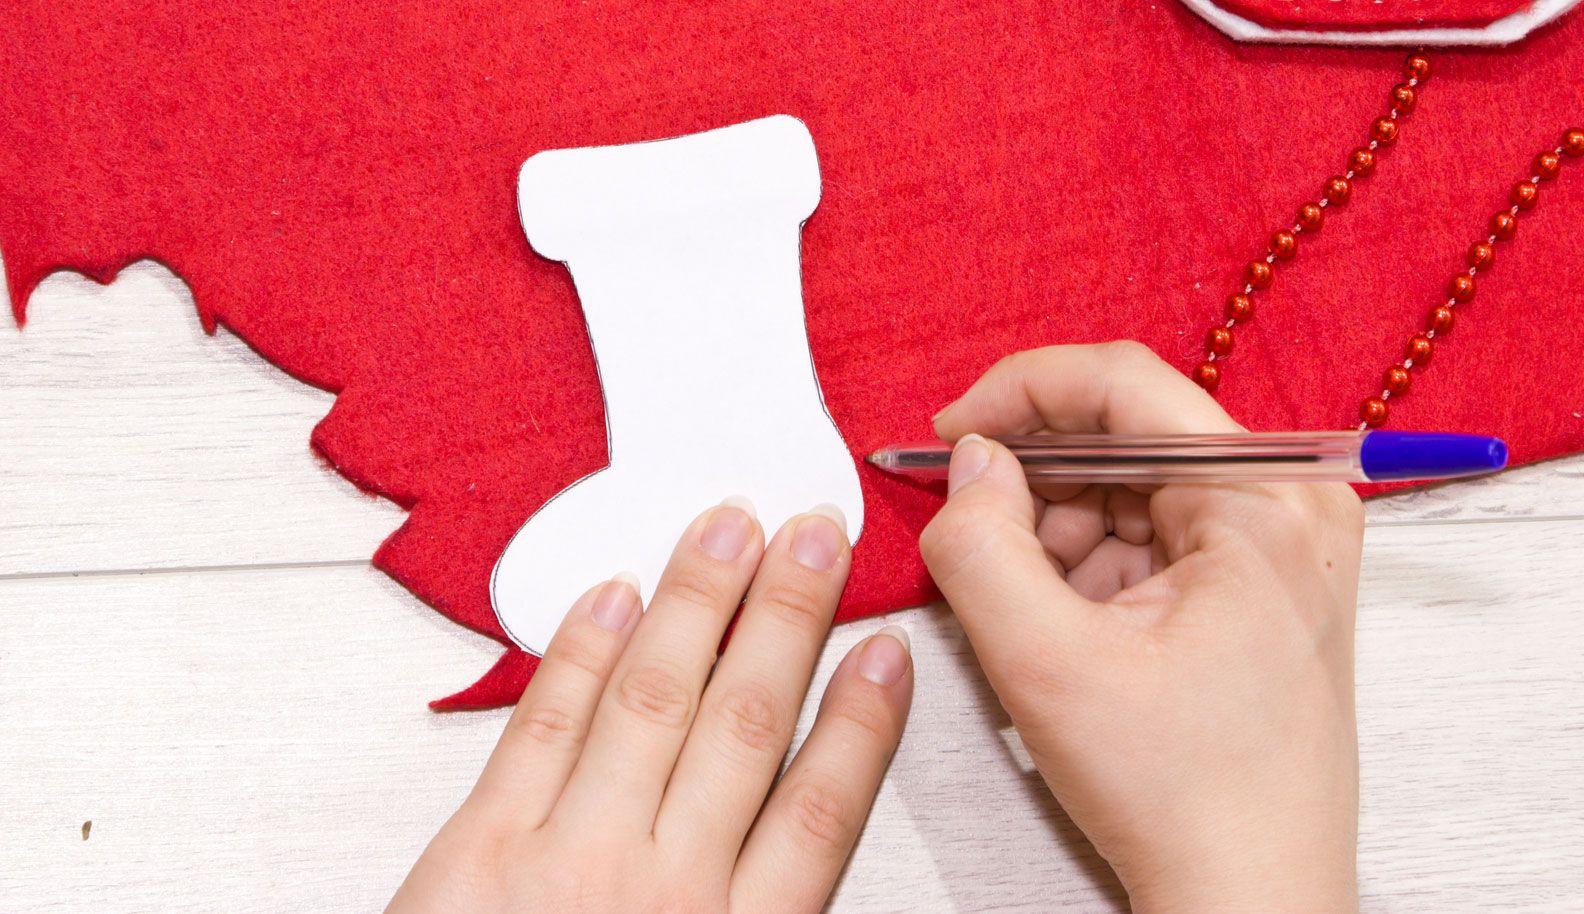 Adorno navideño con forma de calcetín